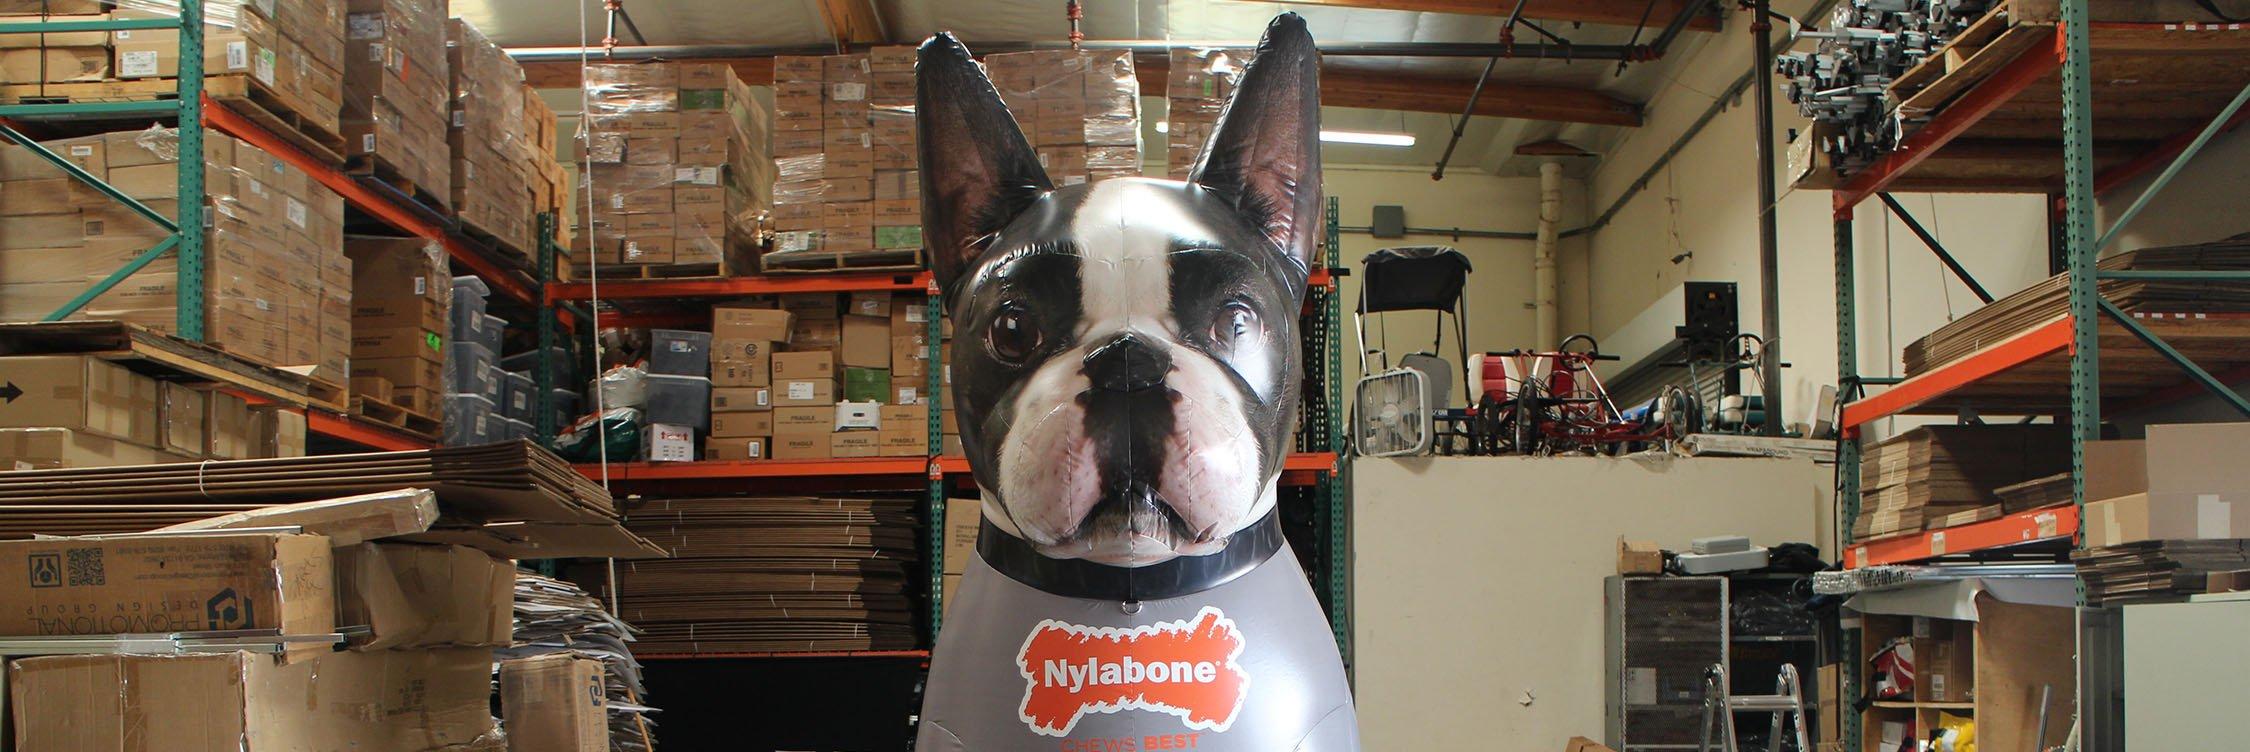 nylabone-dog-inflatable